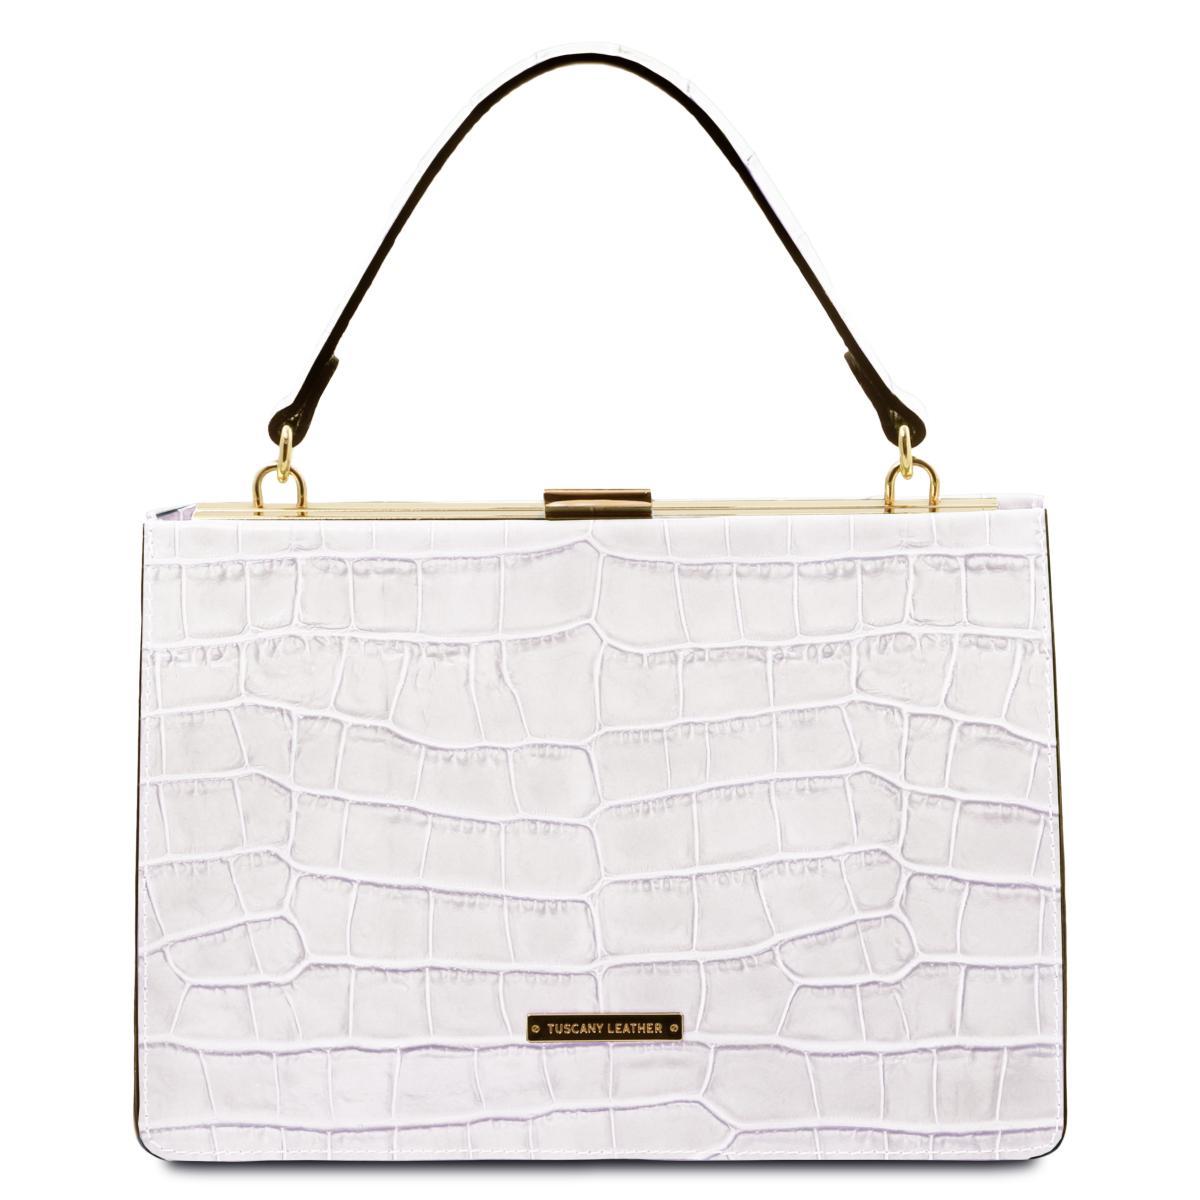 Tuscany Leather Aura Sac /à Main en Cuir Blanc